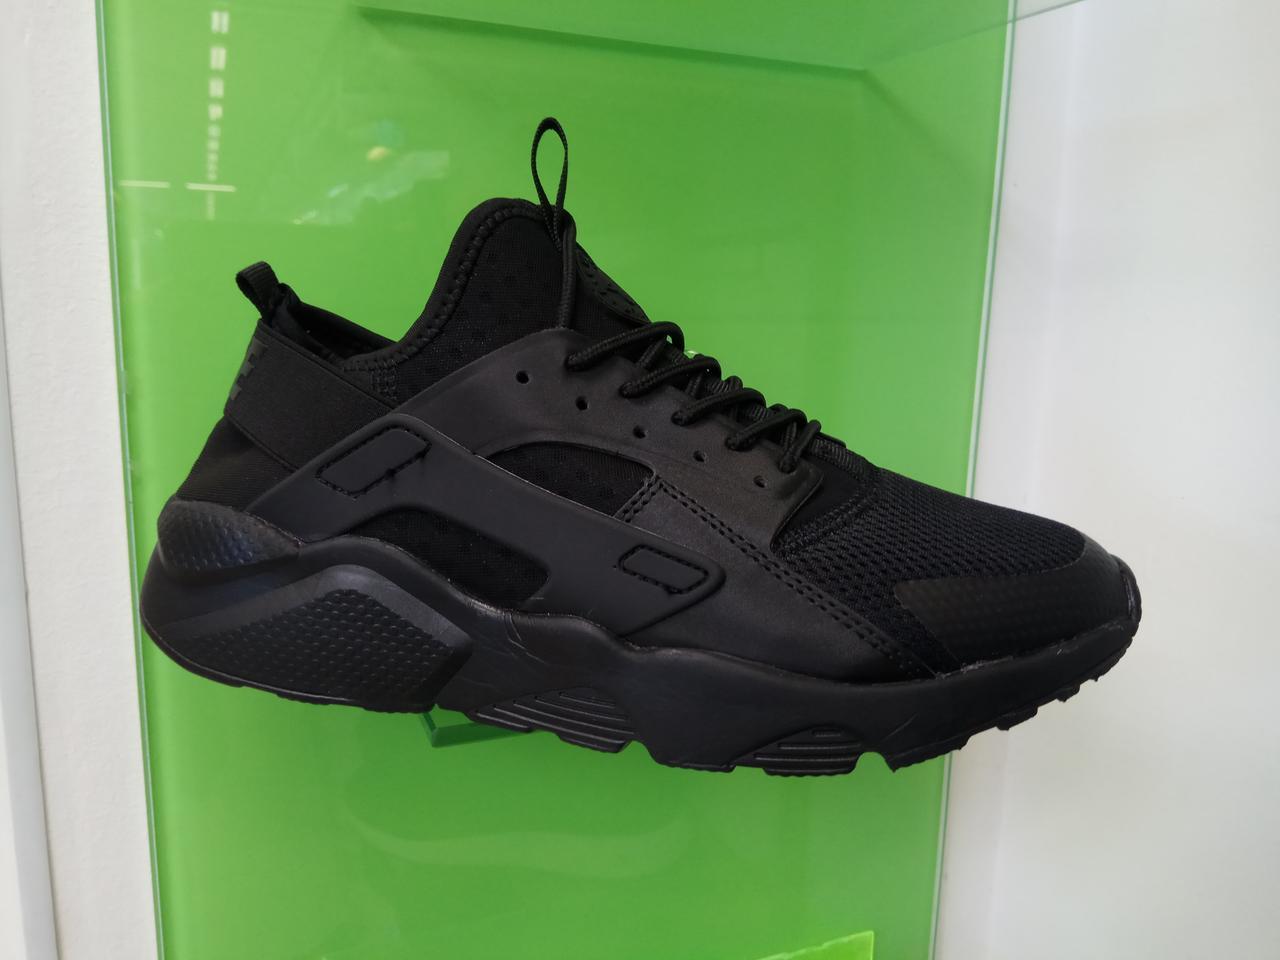 Женские кроссовки   в стиле Air Huarache  Black